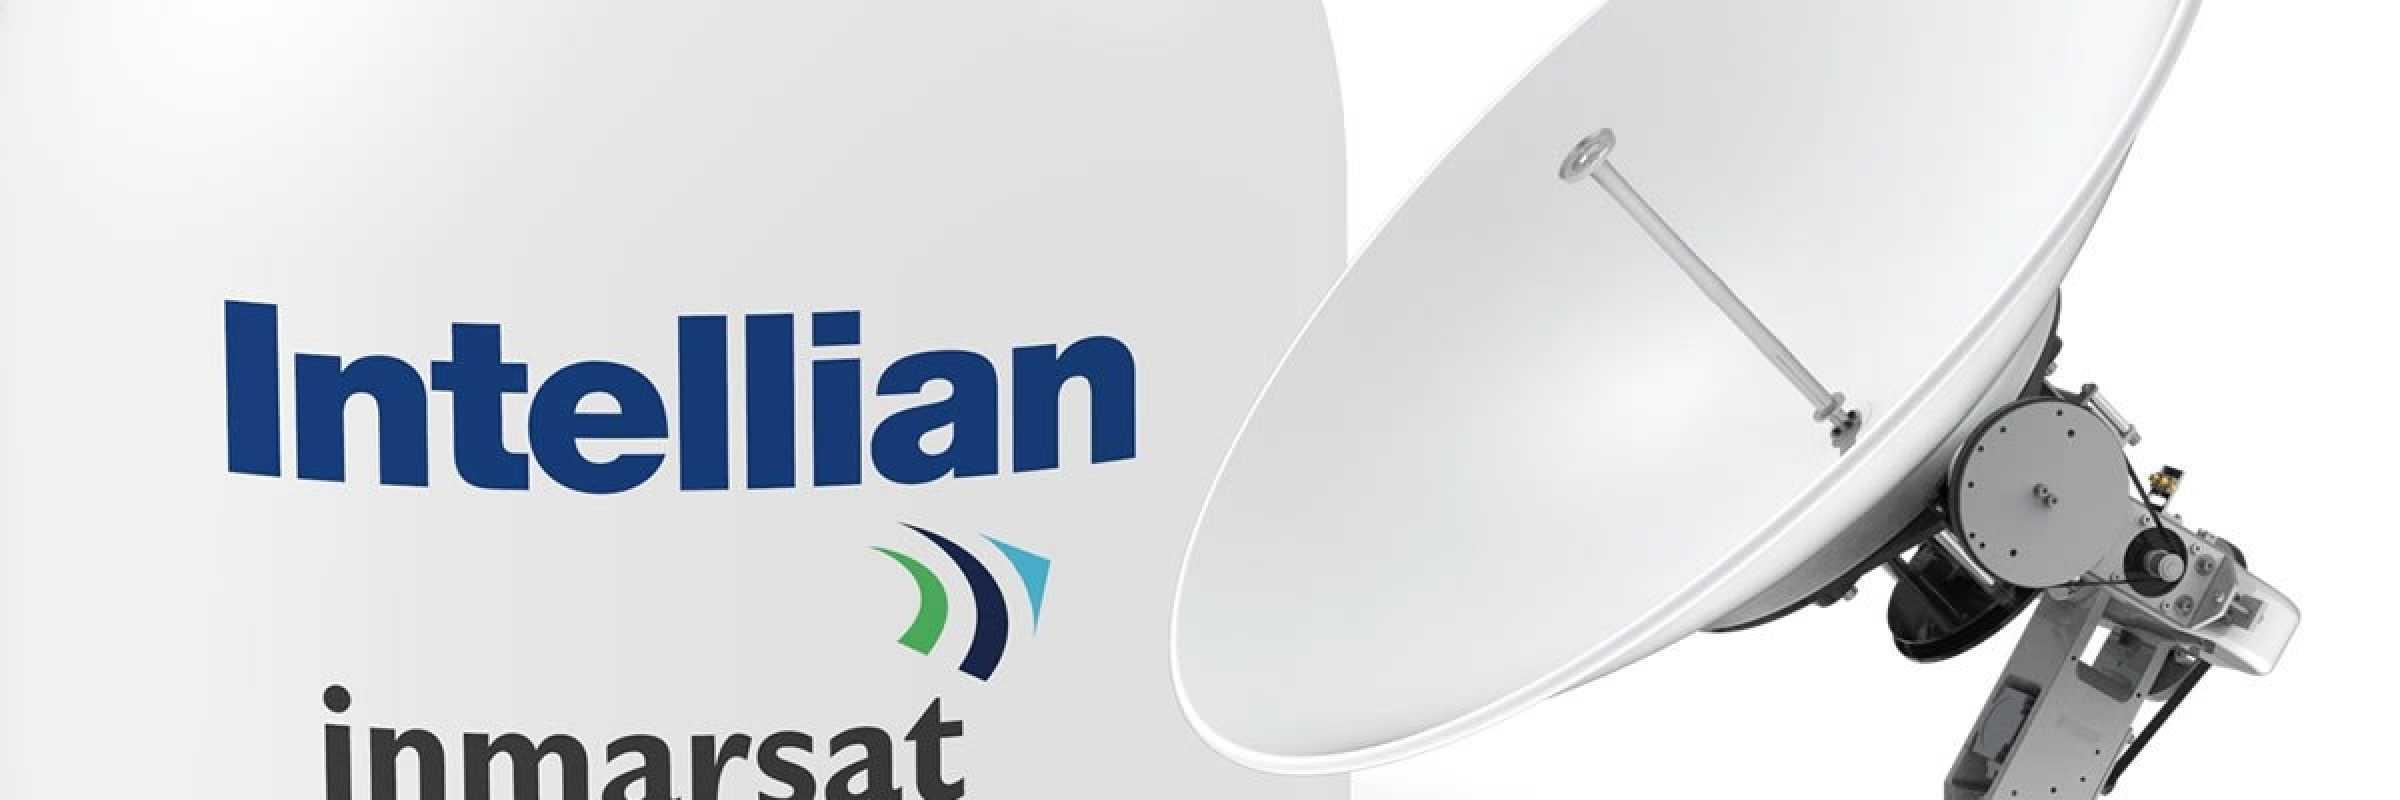 Intellian GX100NX antenna approved by Inmarsat